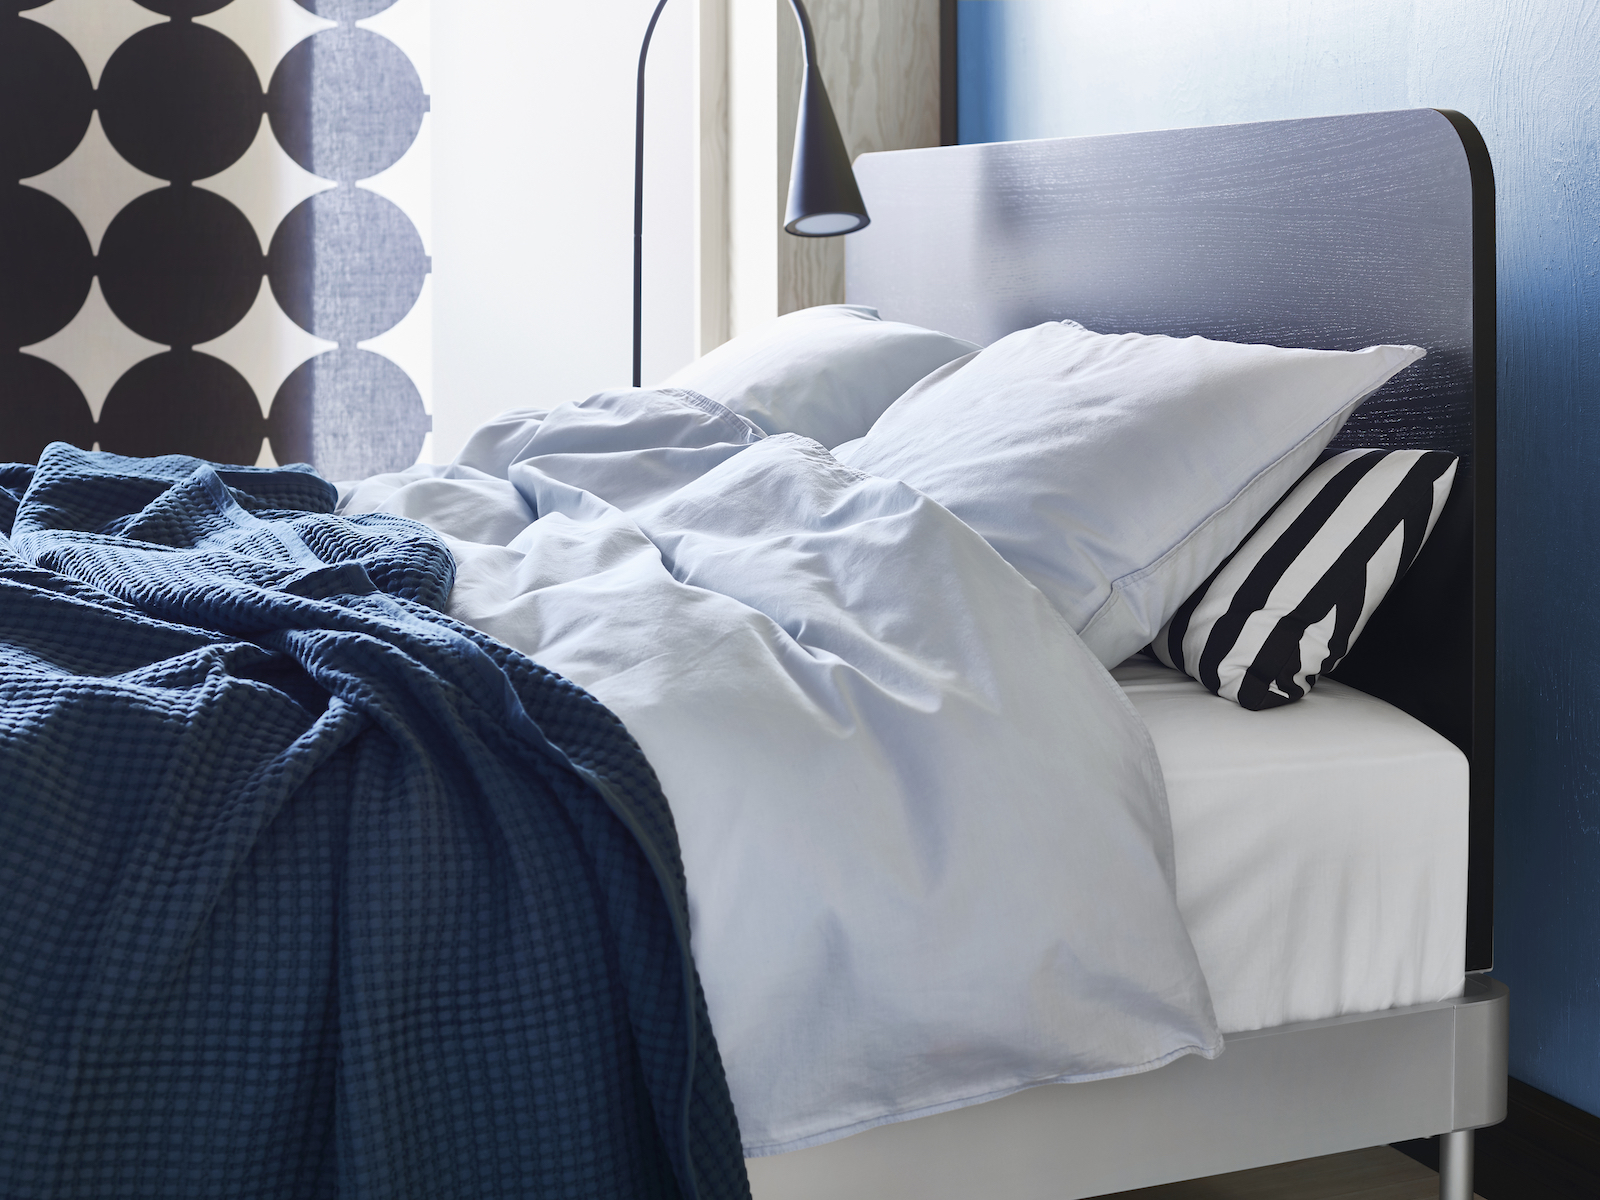 Ikea is launching a customizable modular bed